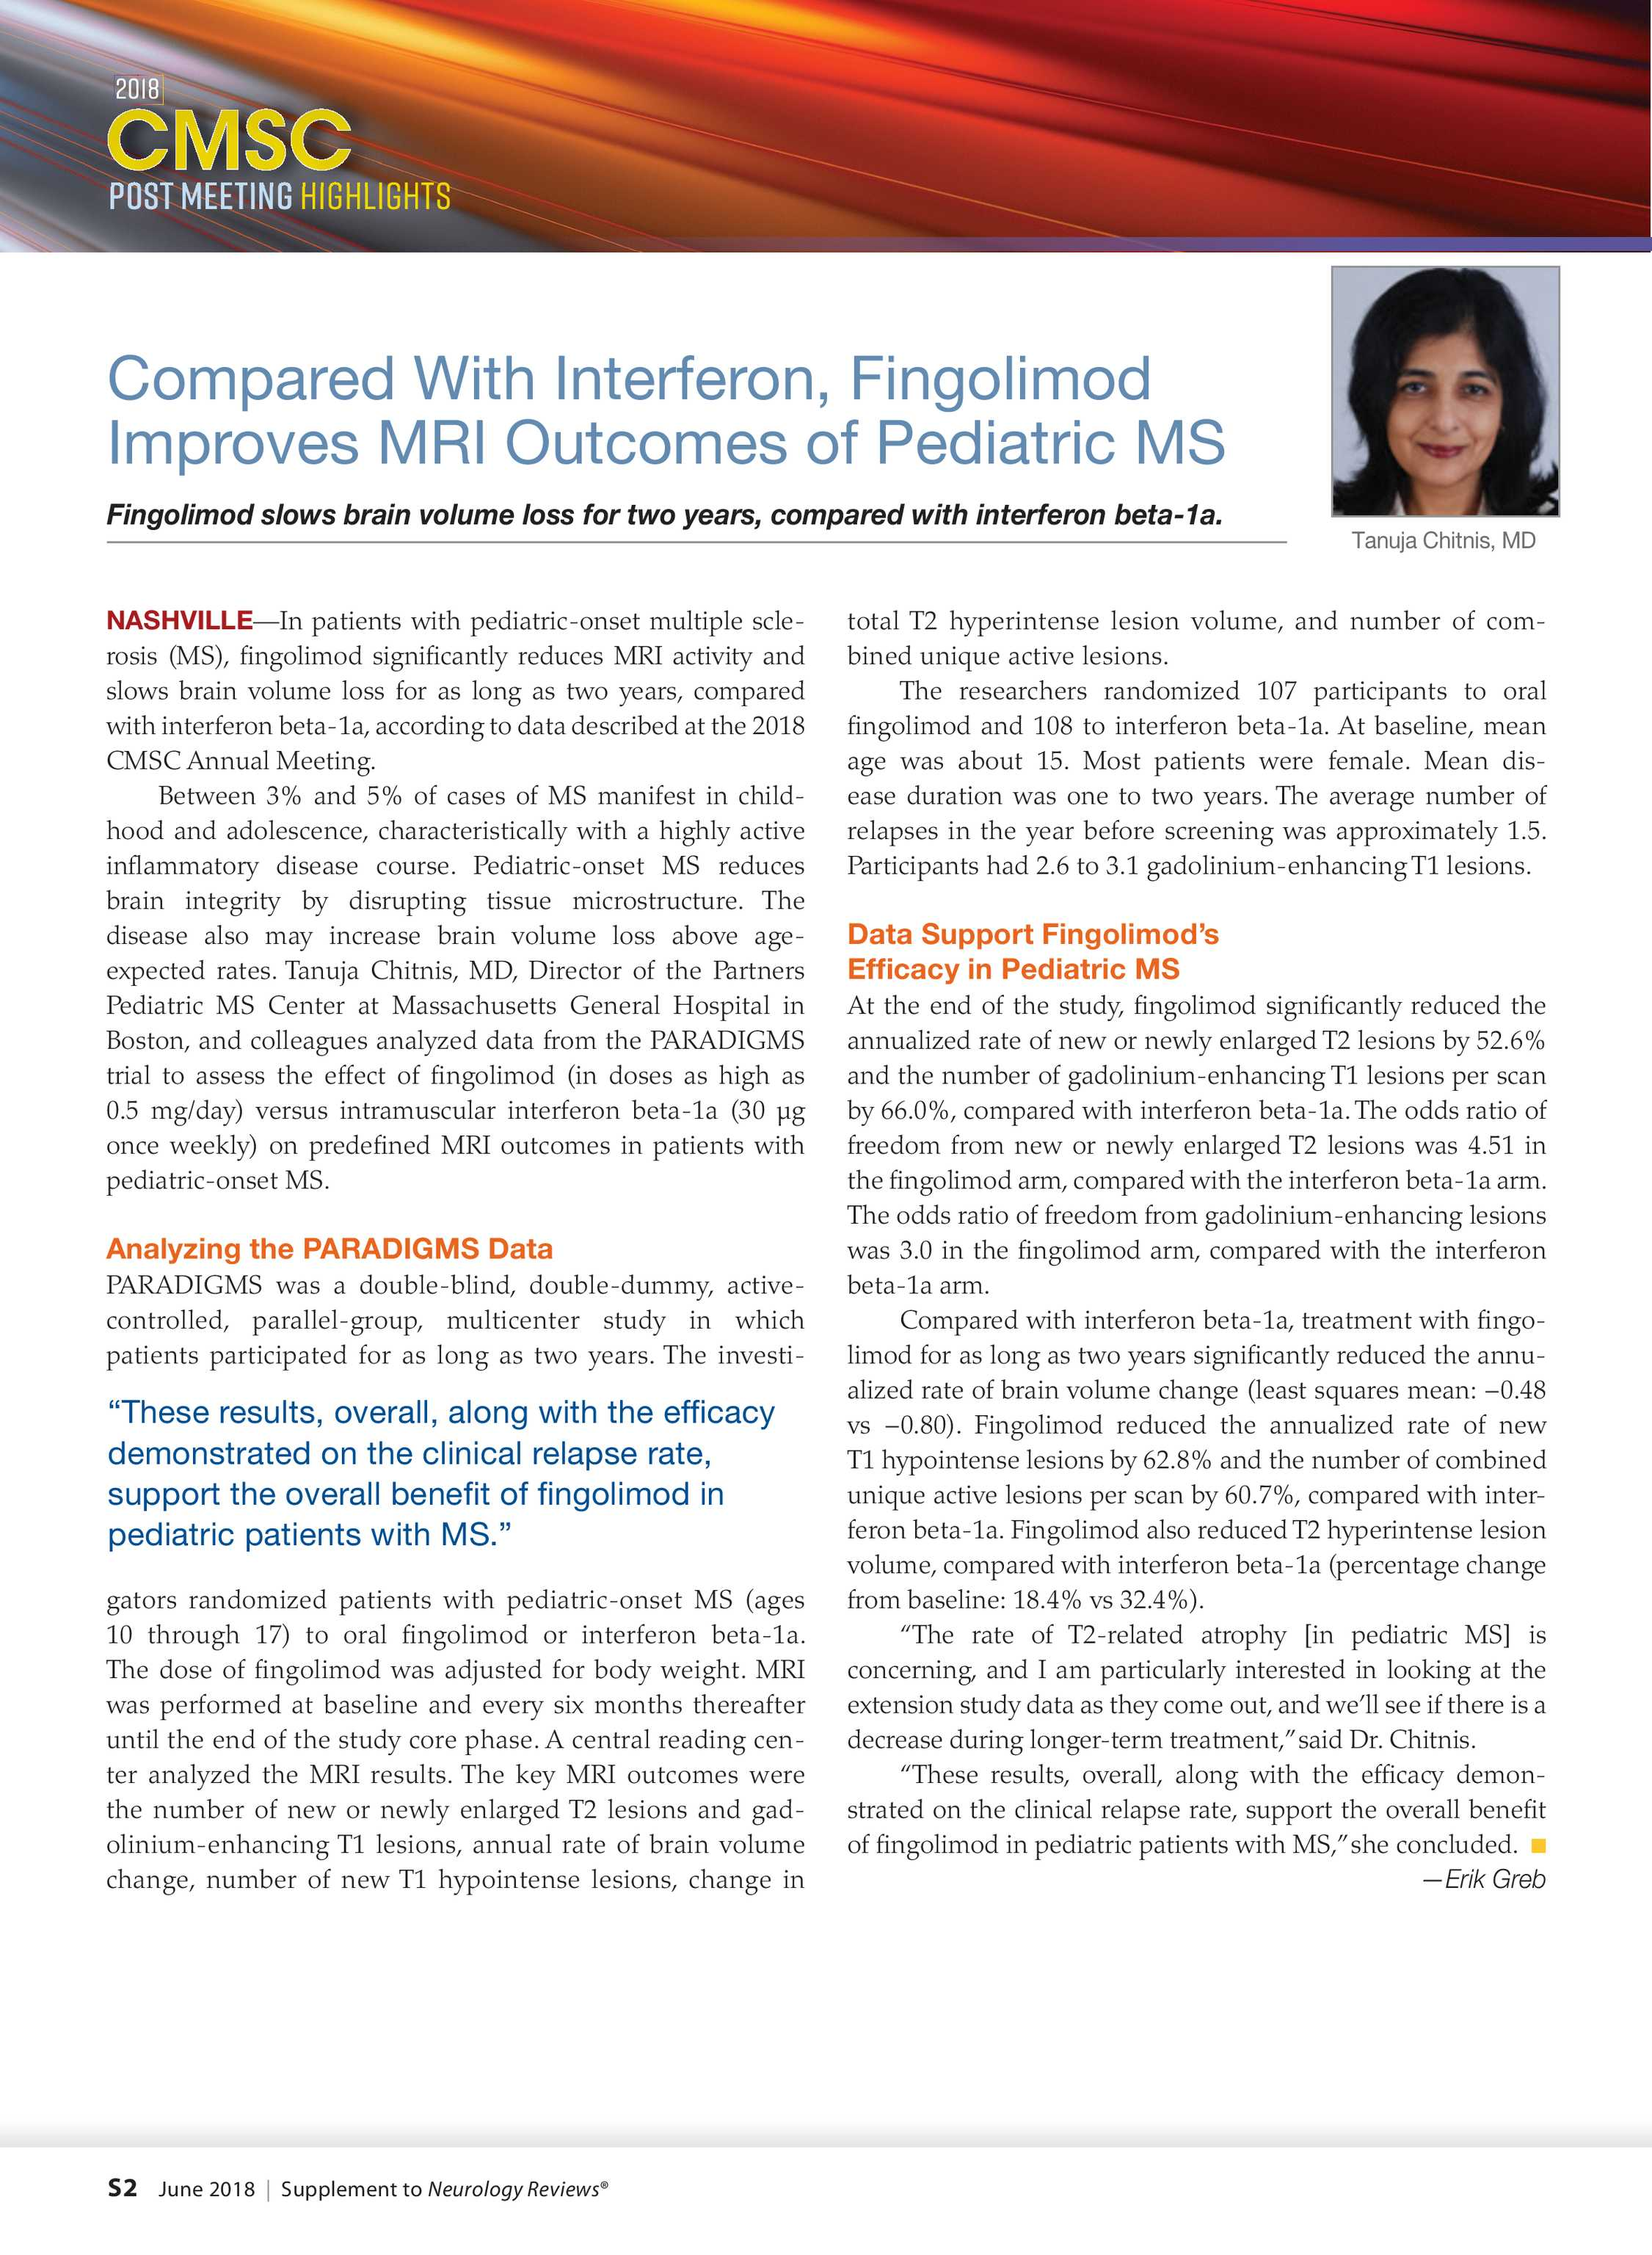 691062225515 Neurology Reviews - NR CMSC Highlights Supp 0618 - page S2